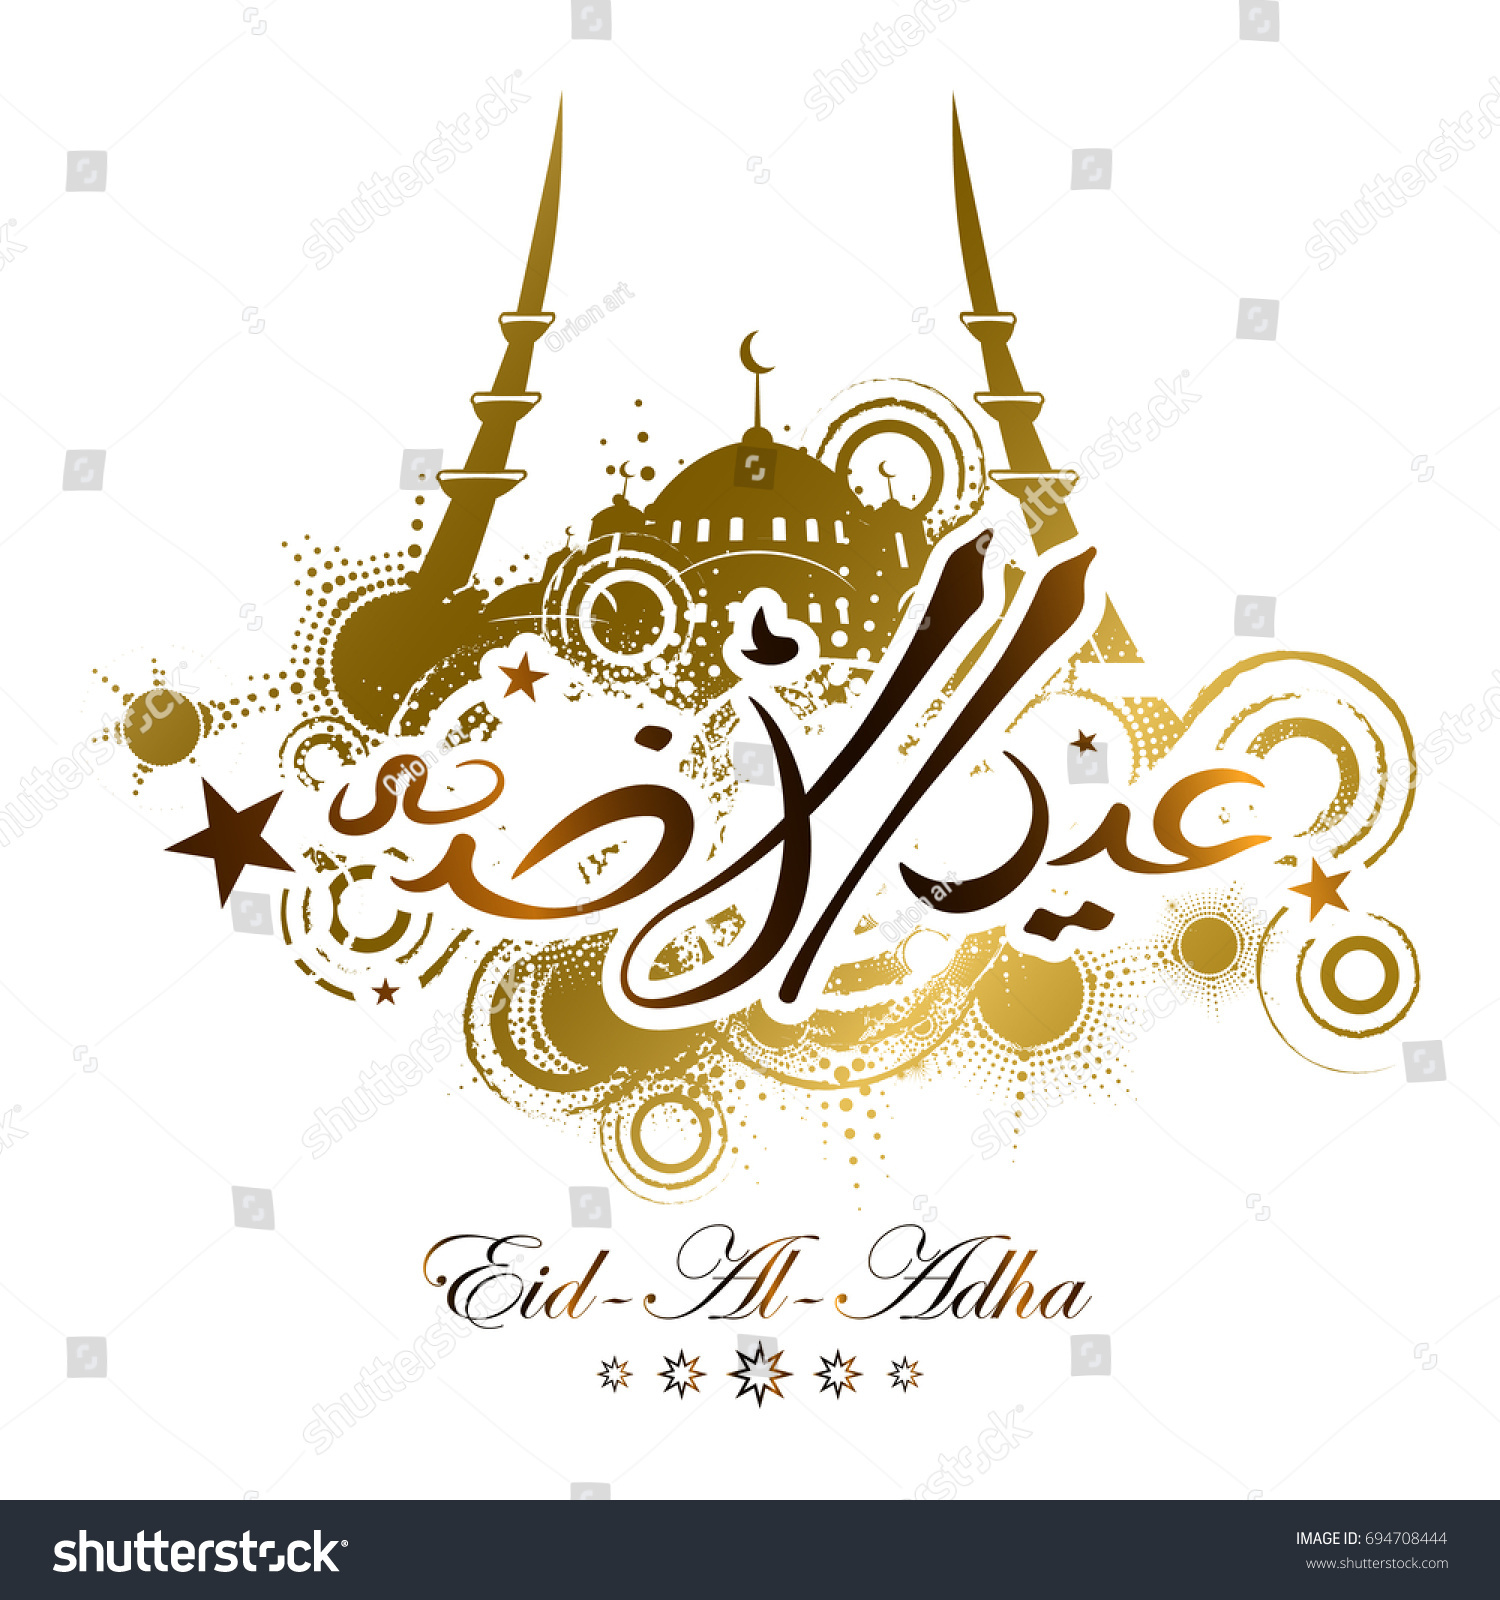 Eid Al Adha Greeting Cards Religious Stock Illustration 694708444